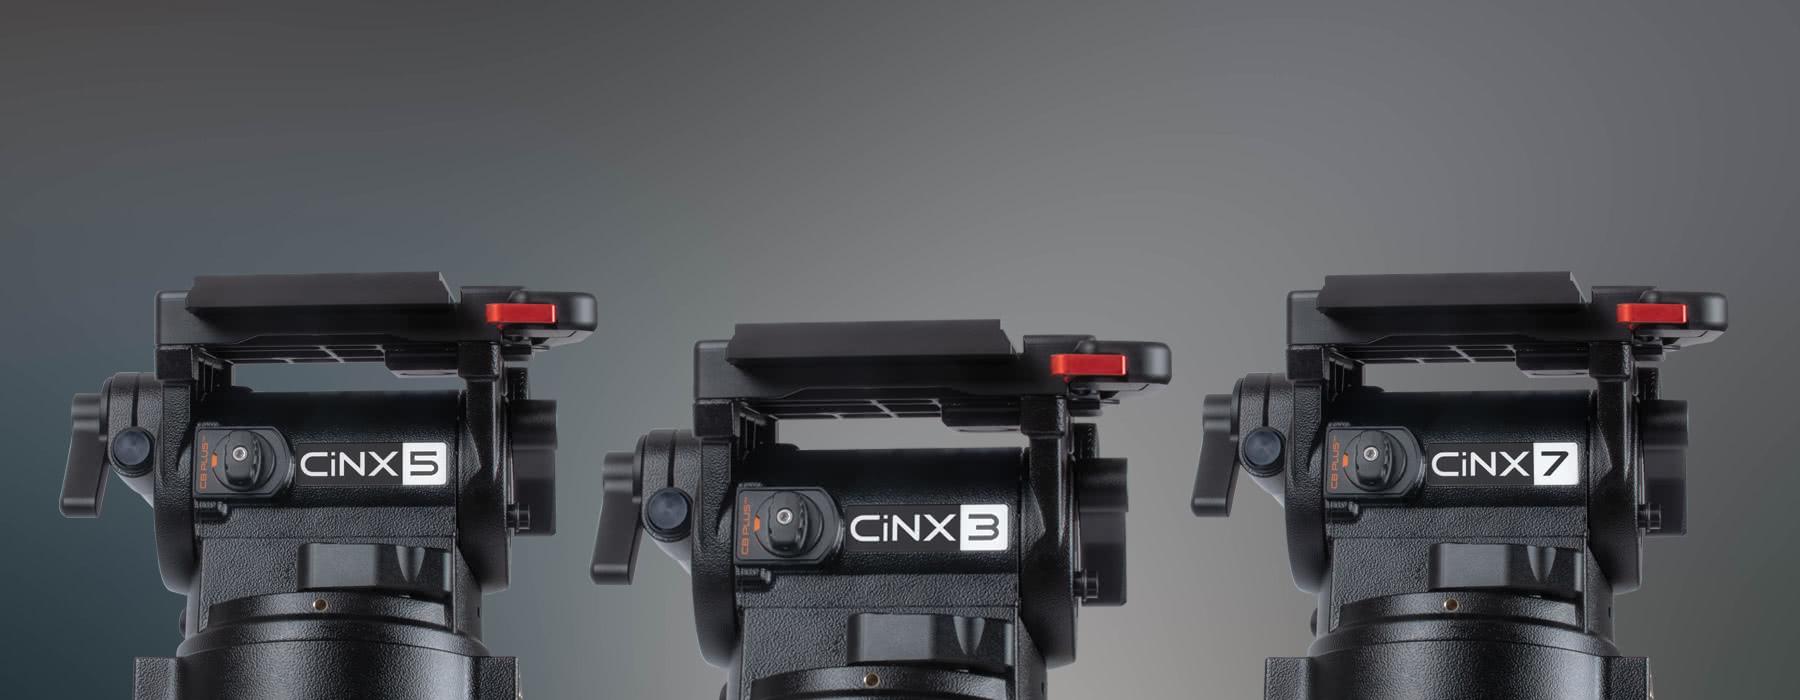 NEW CiNX Series